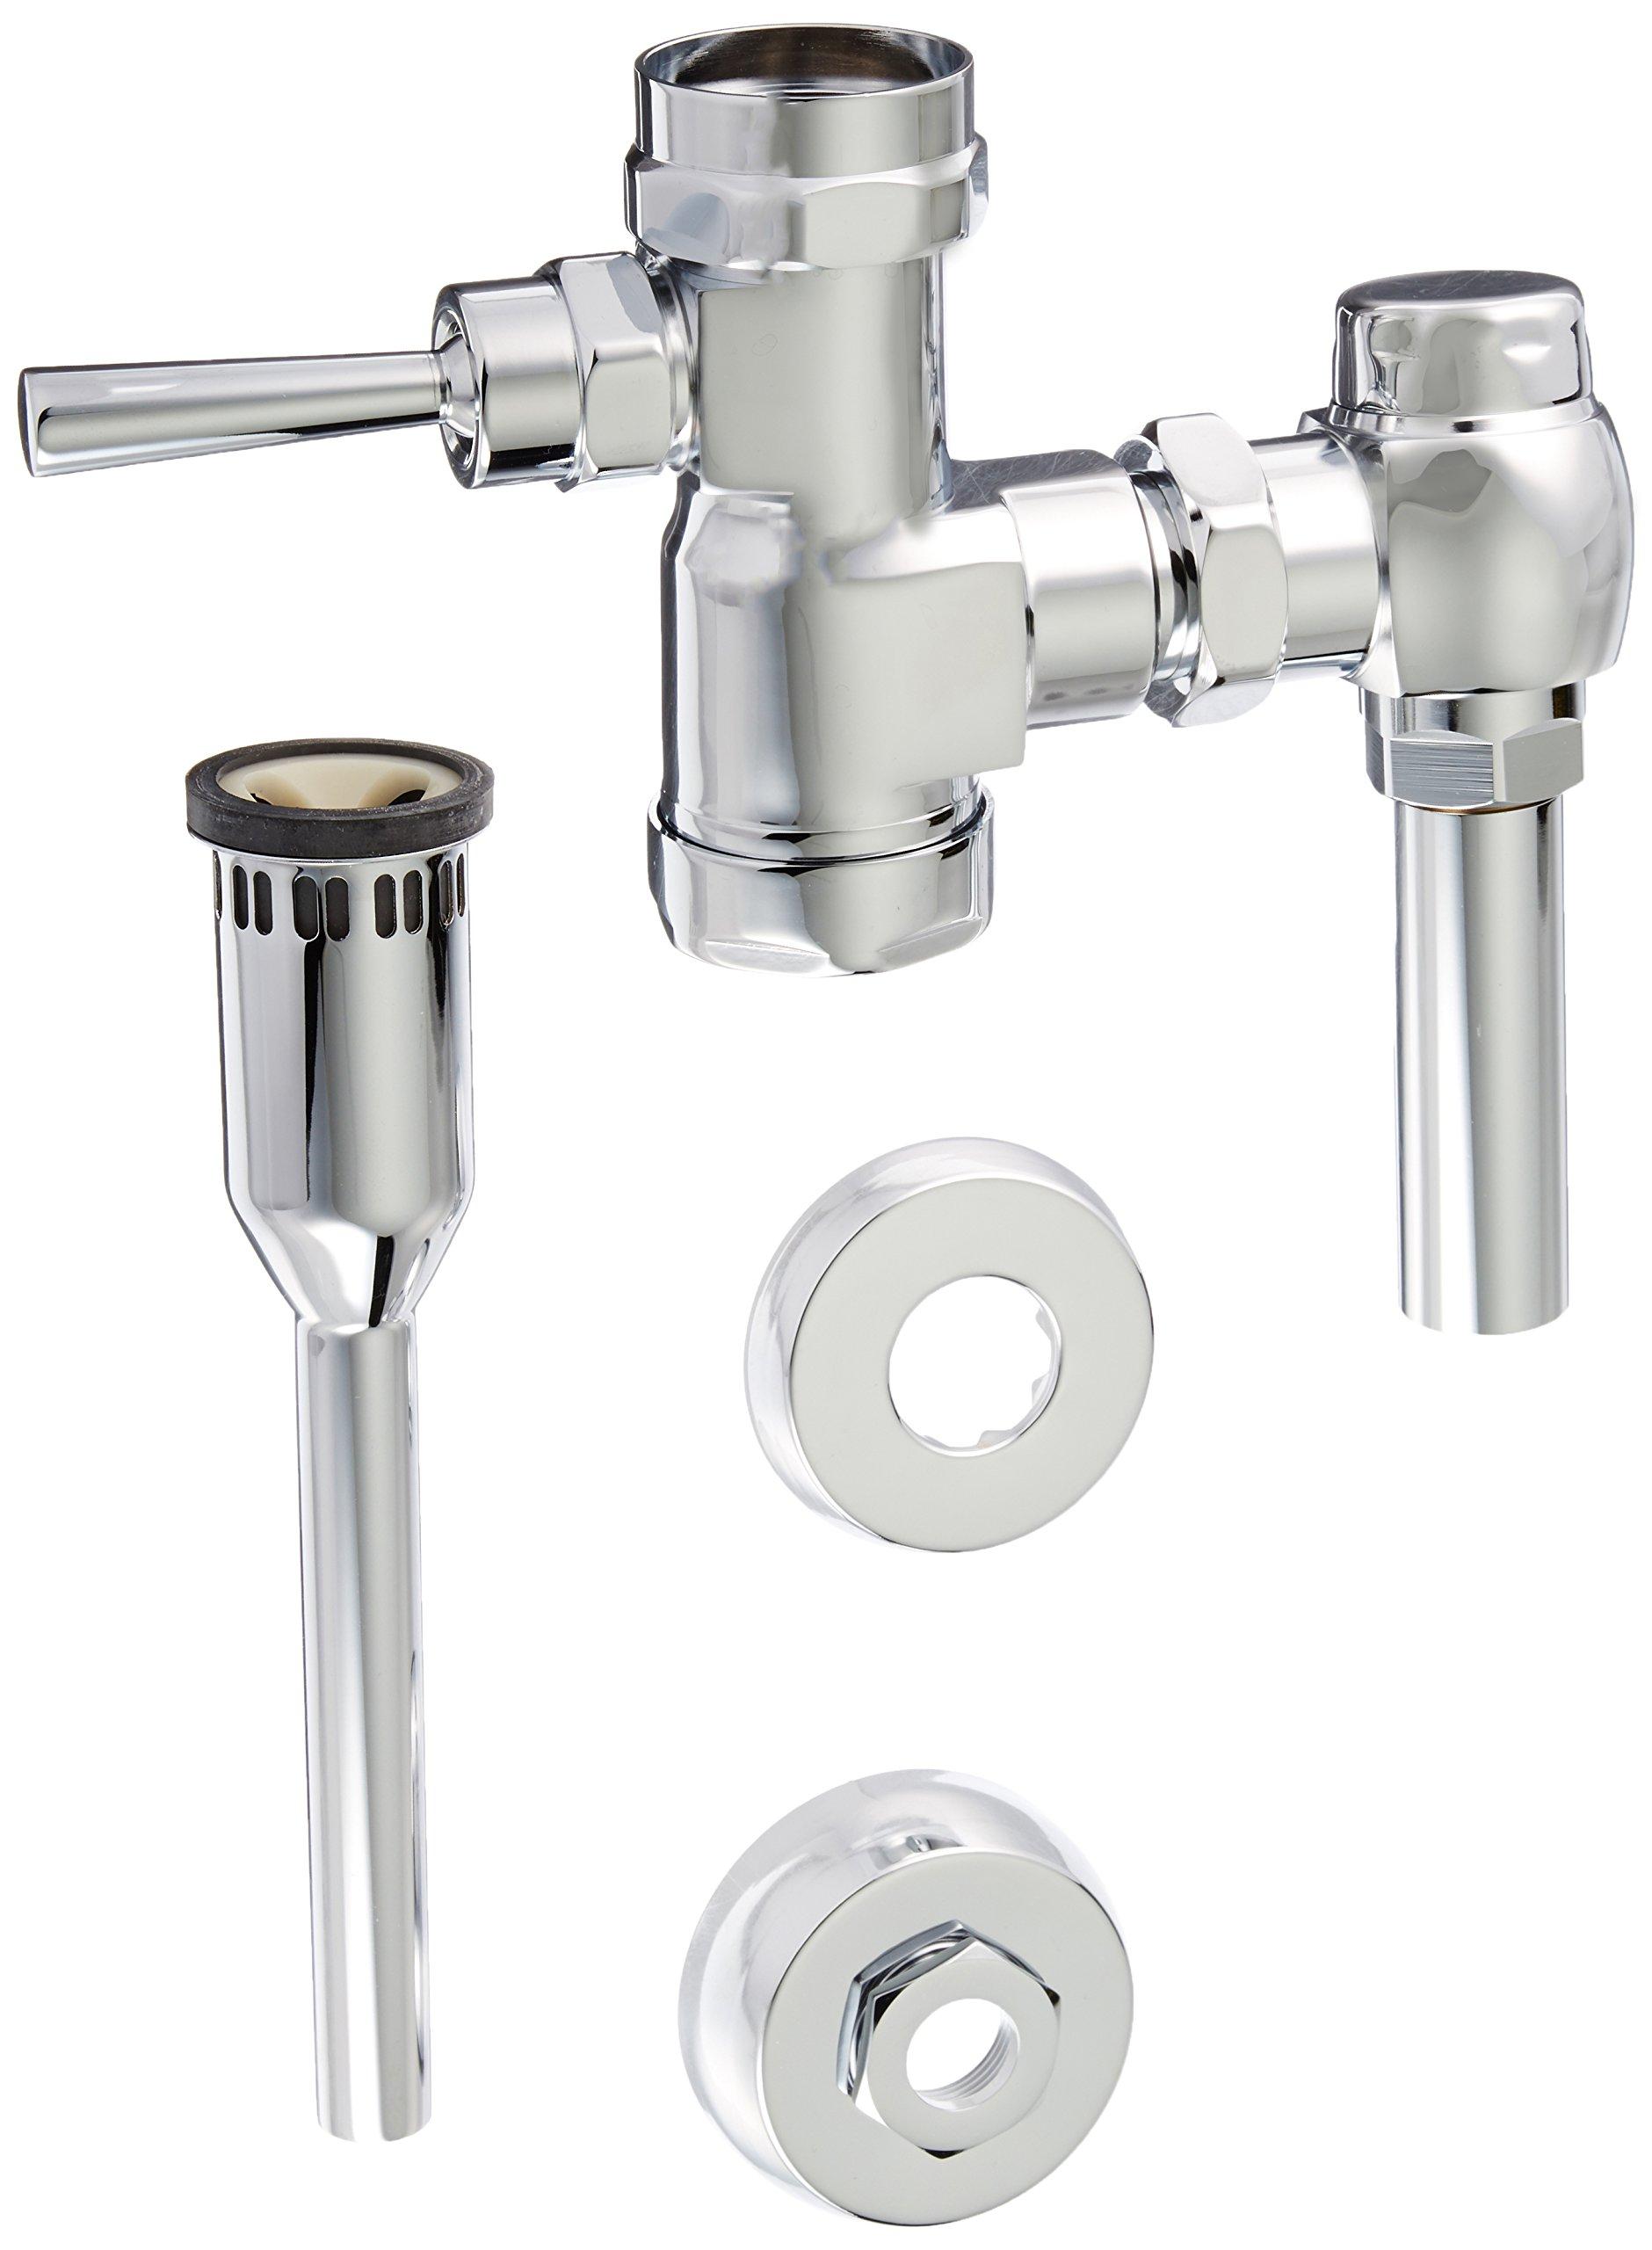 American Standard 6045510.002 1.0 GPF Manual FloWise Urinal Flush Valve, Chrome